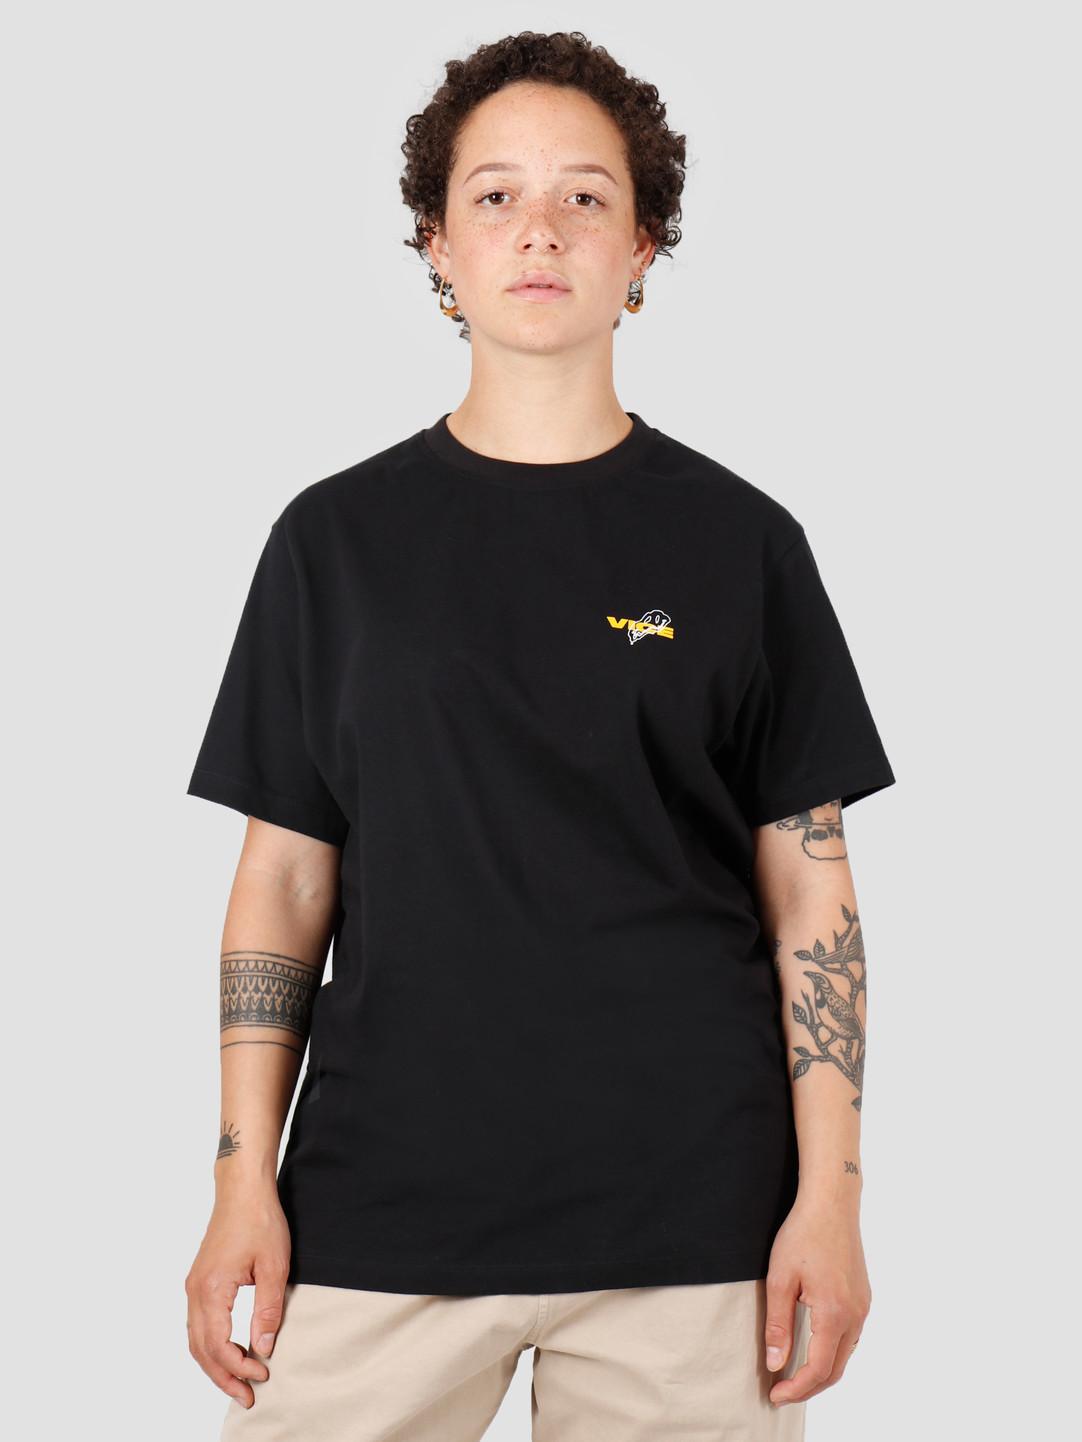 Vice VICE Vreselijk Genieten T-shirt Black Yellow